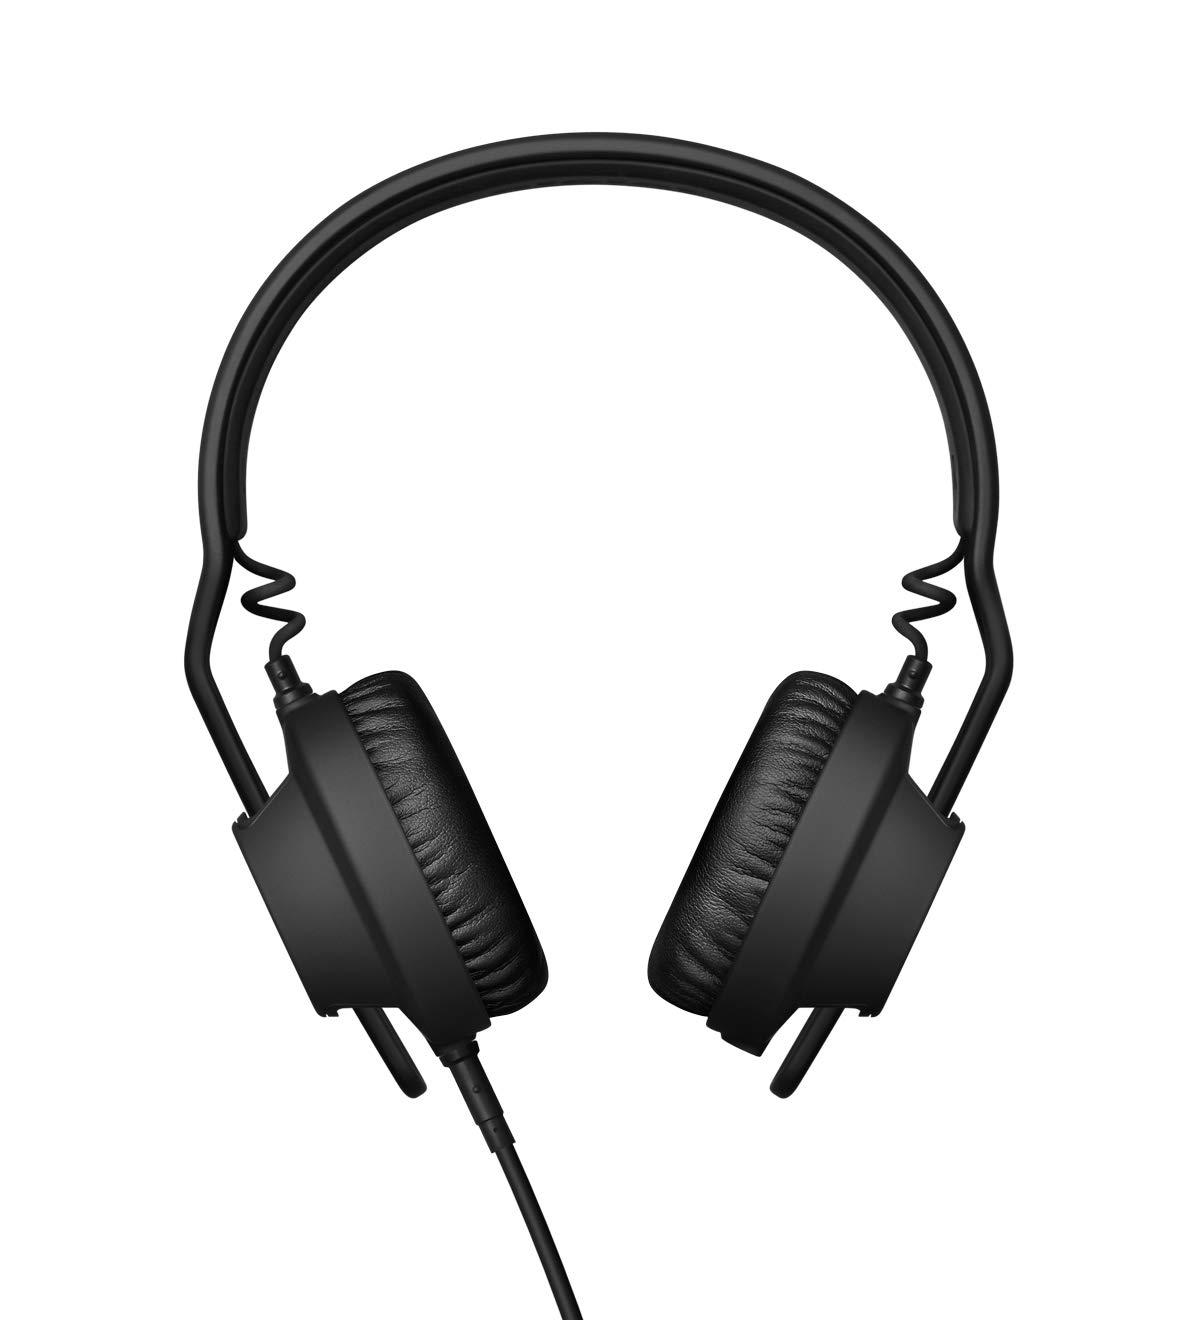 AIAIAI TMA-2 Modular DJ preset Headphones